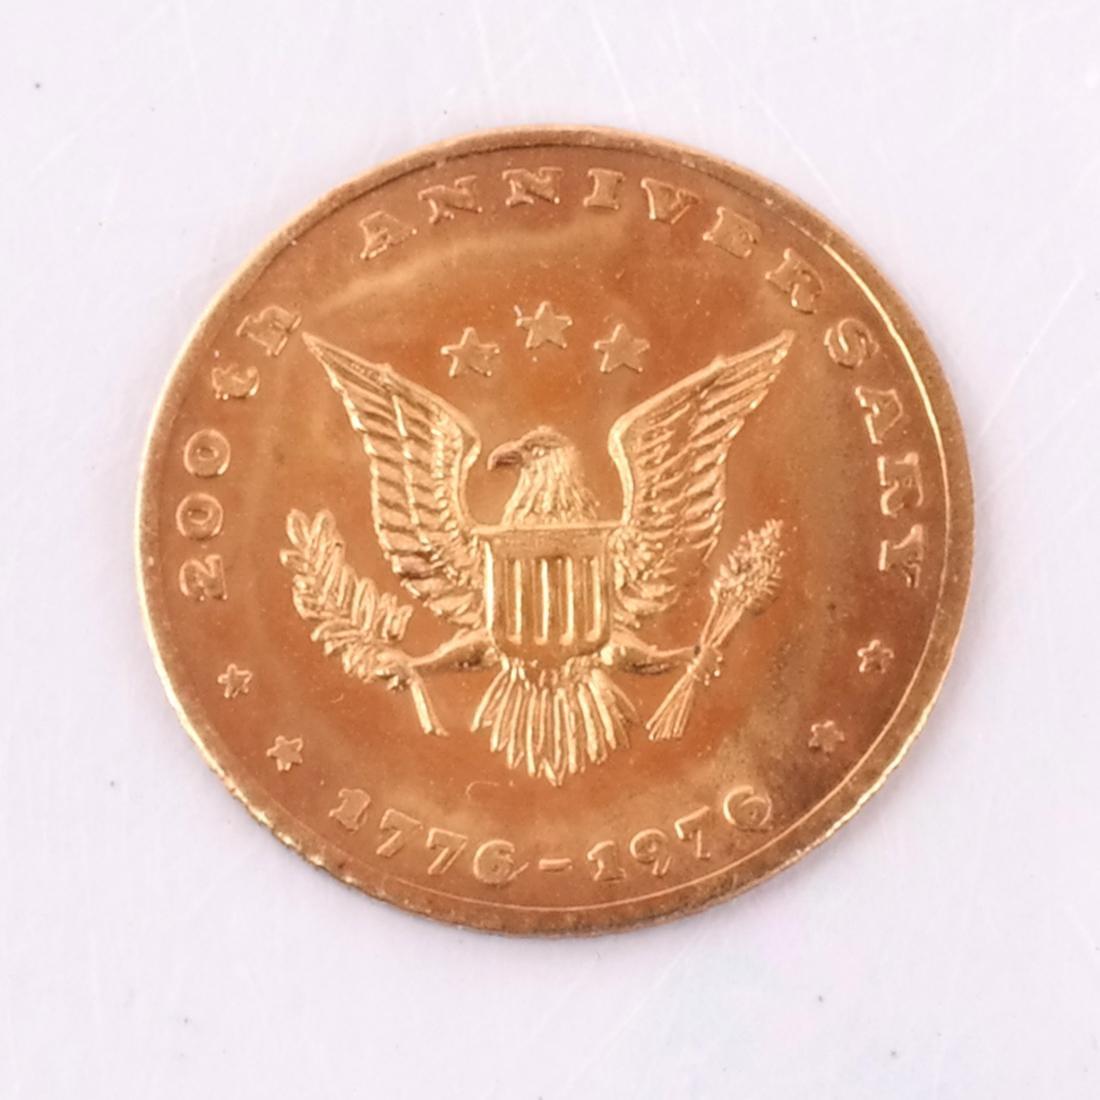 1999 Gold Eagle, Bicentennial, Kennedy - 3